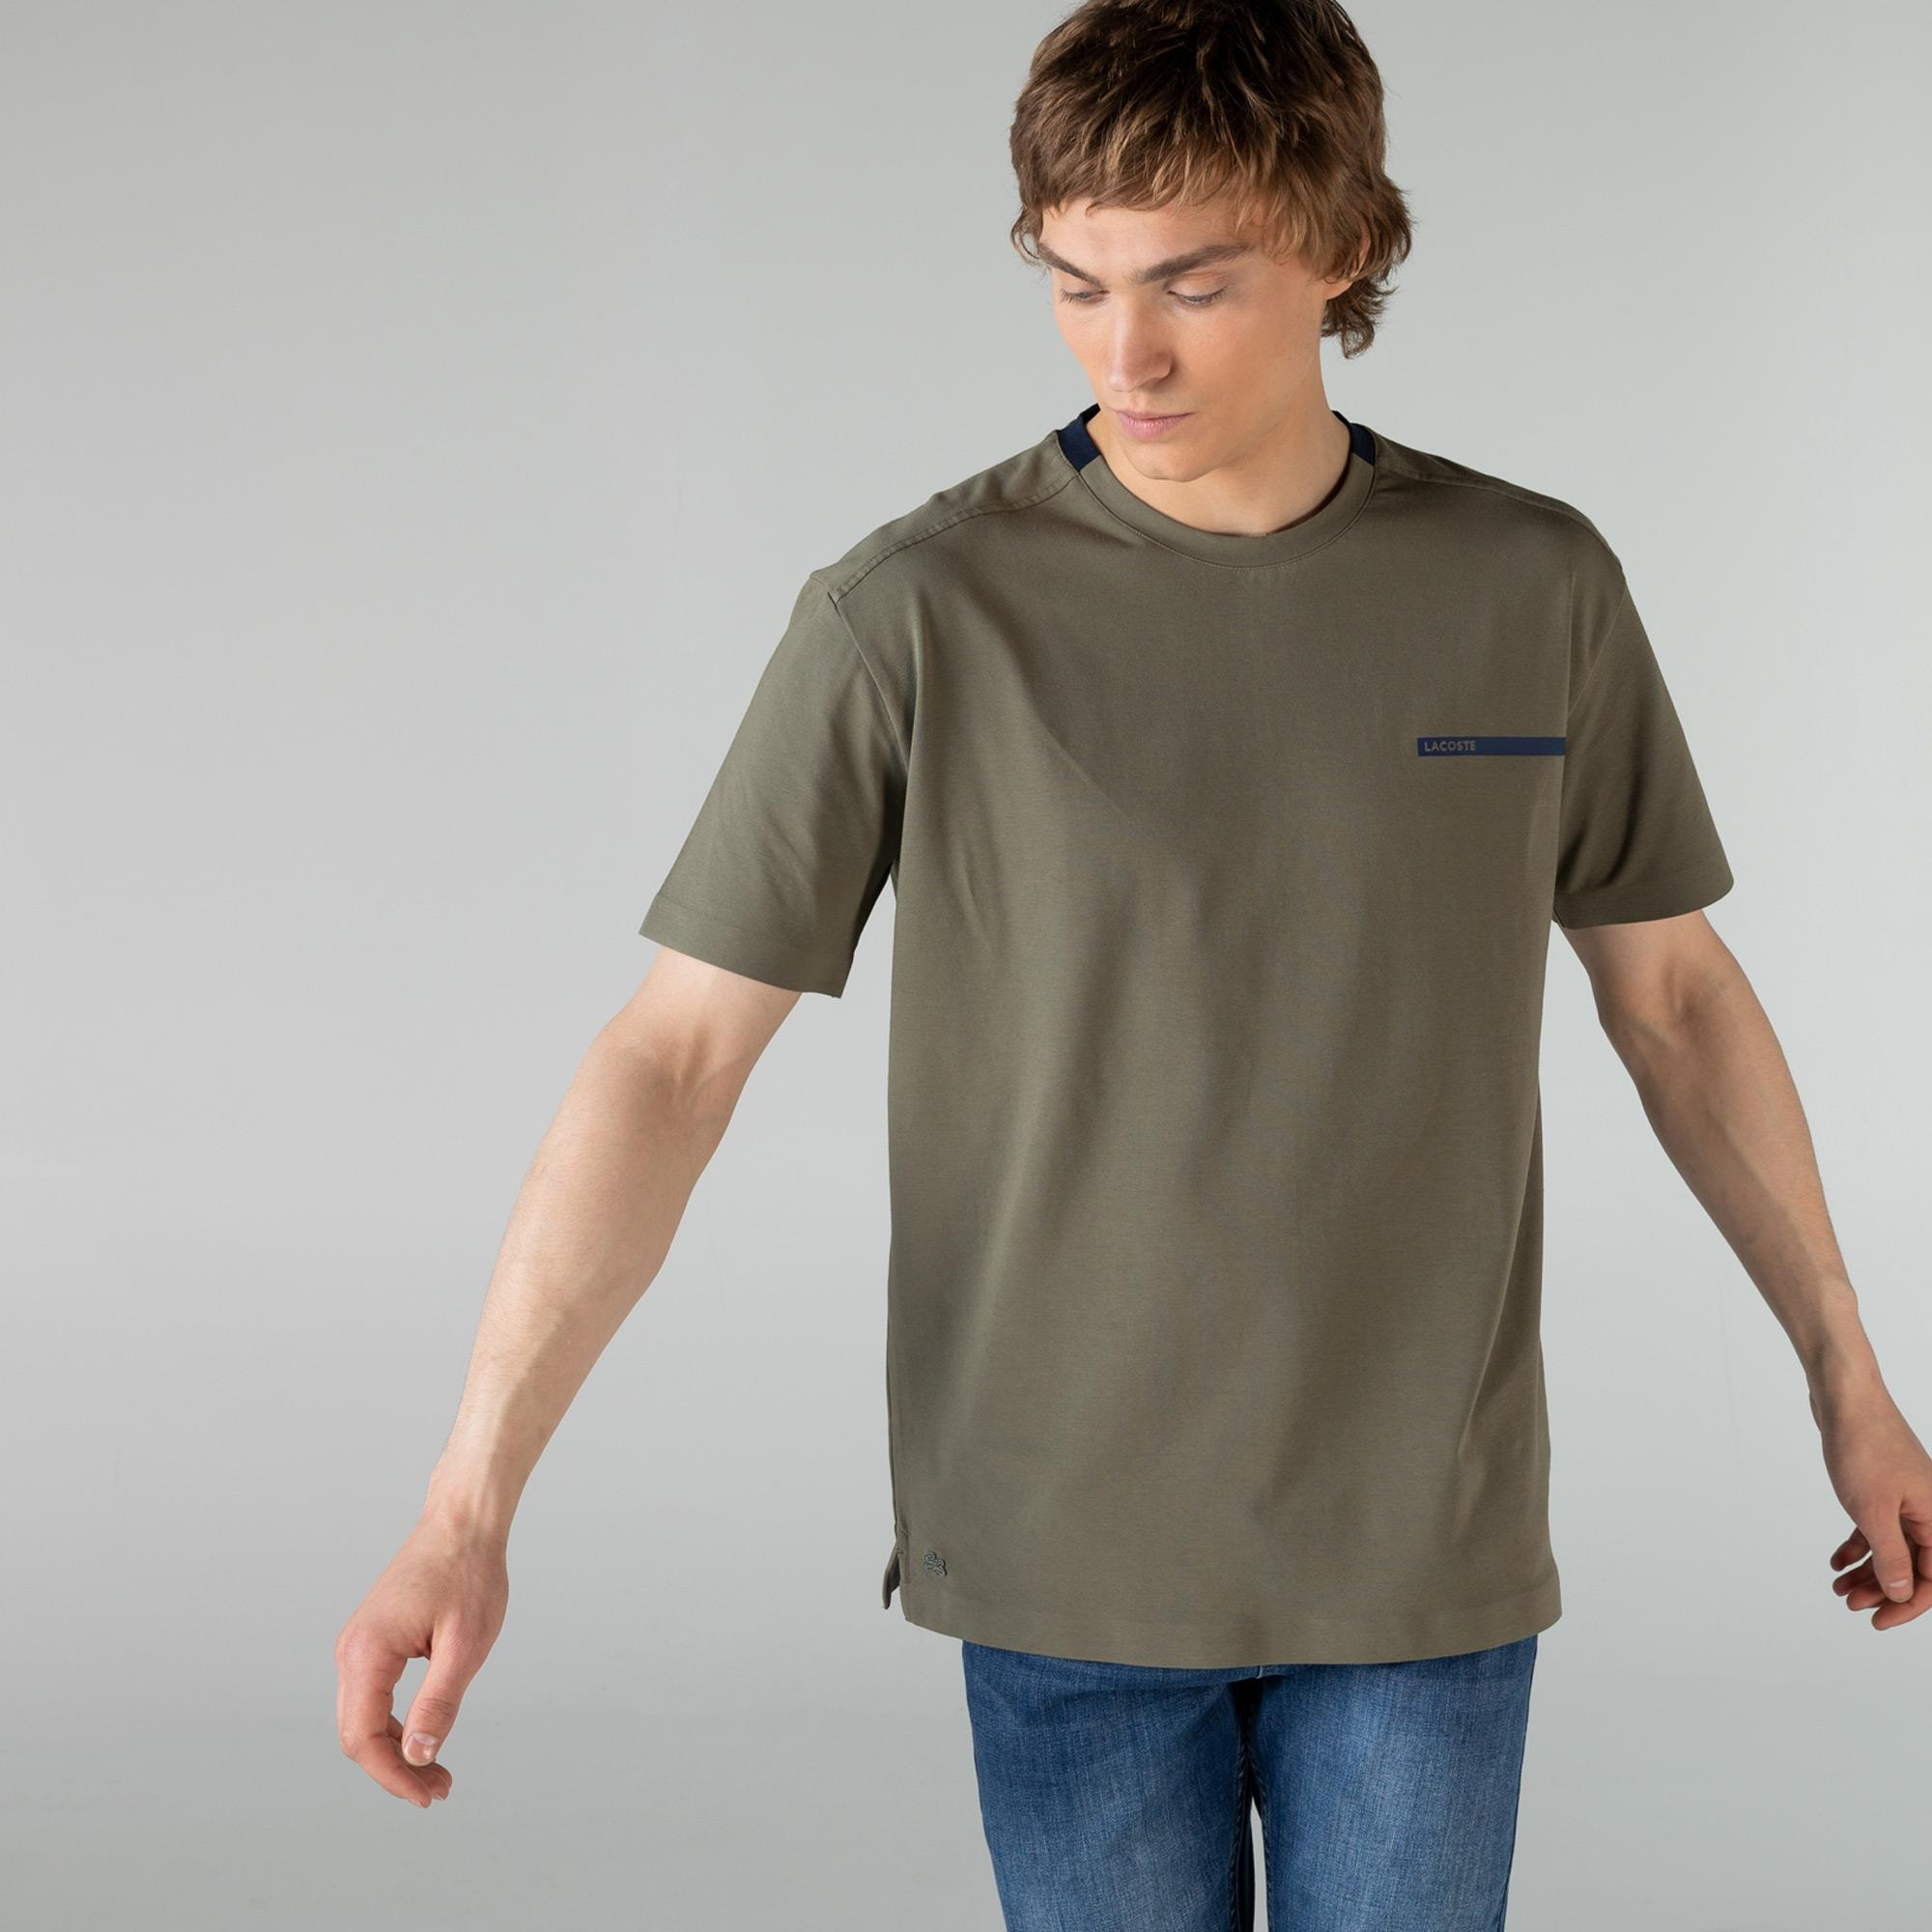 Lacoste Erkek Rahat Fit Bisiklet Yaka Haki T-Shirt